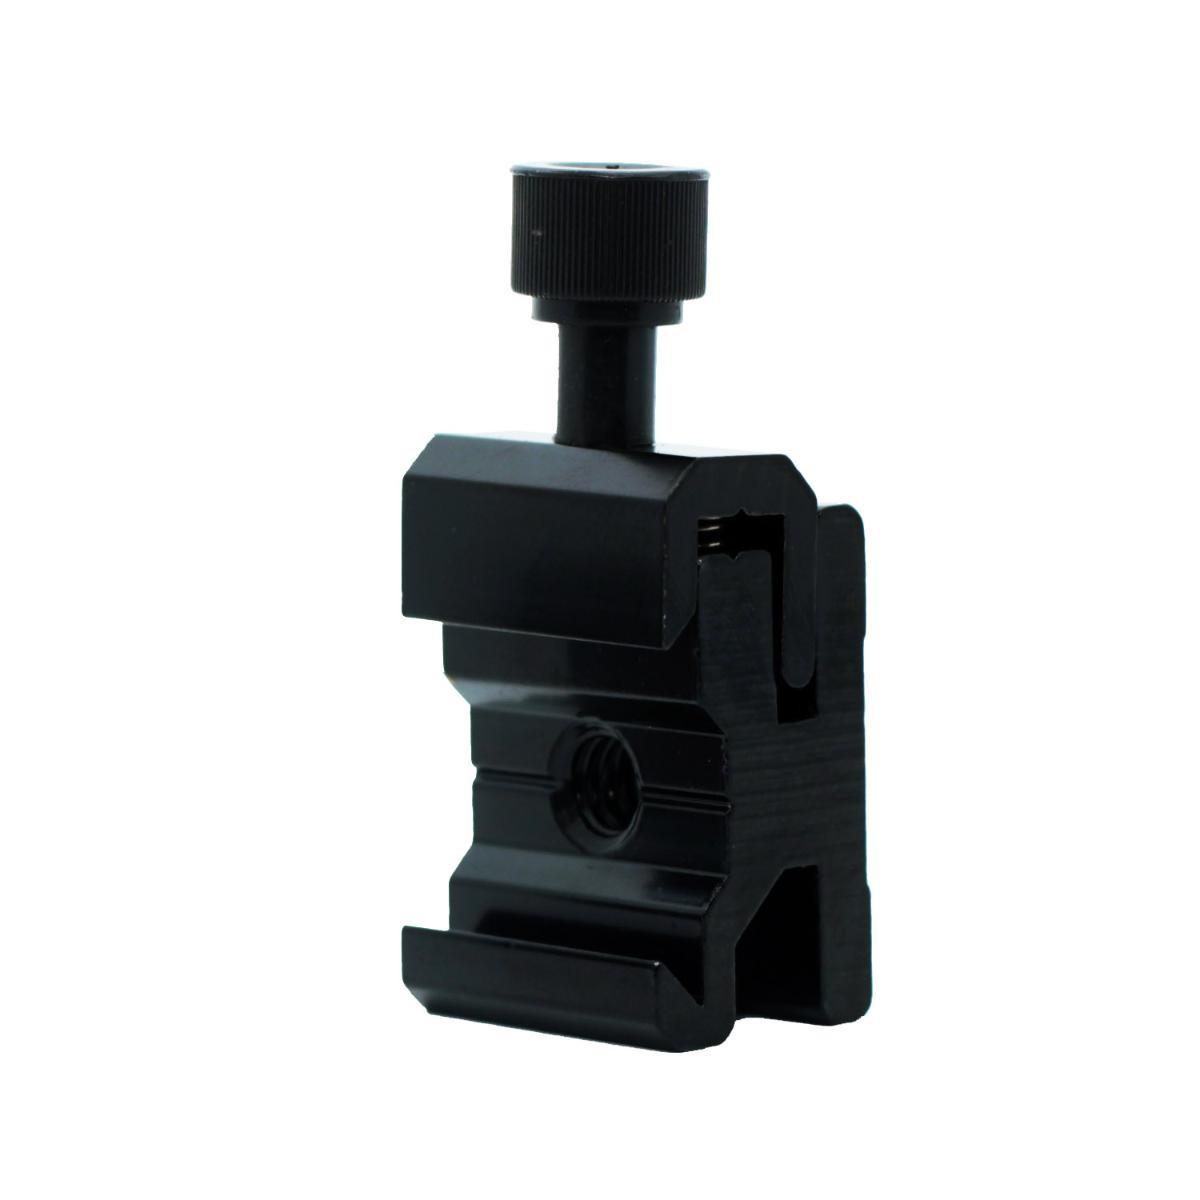 Adaptador Universal Hot Shoe YA5003 para Flash Speedlite  - Fotolux